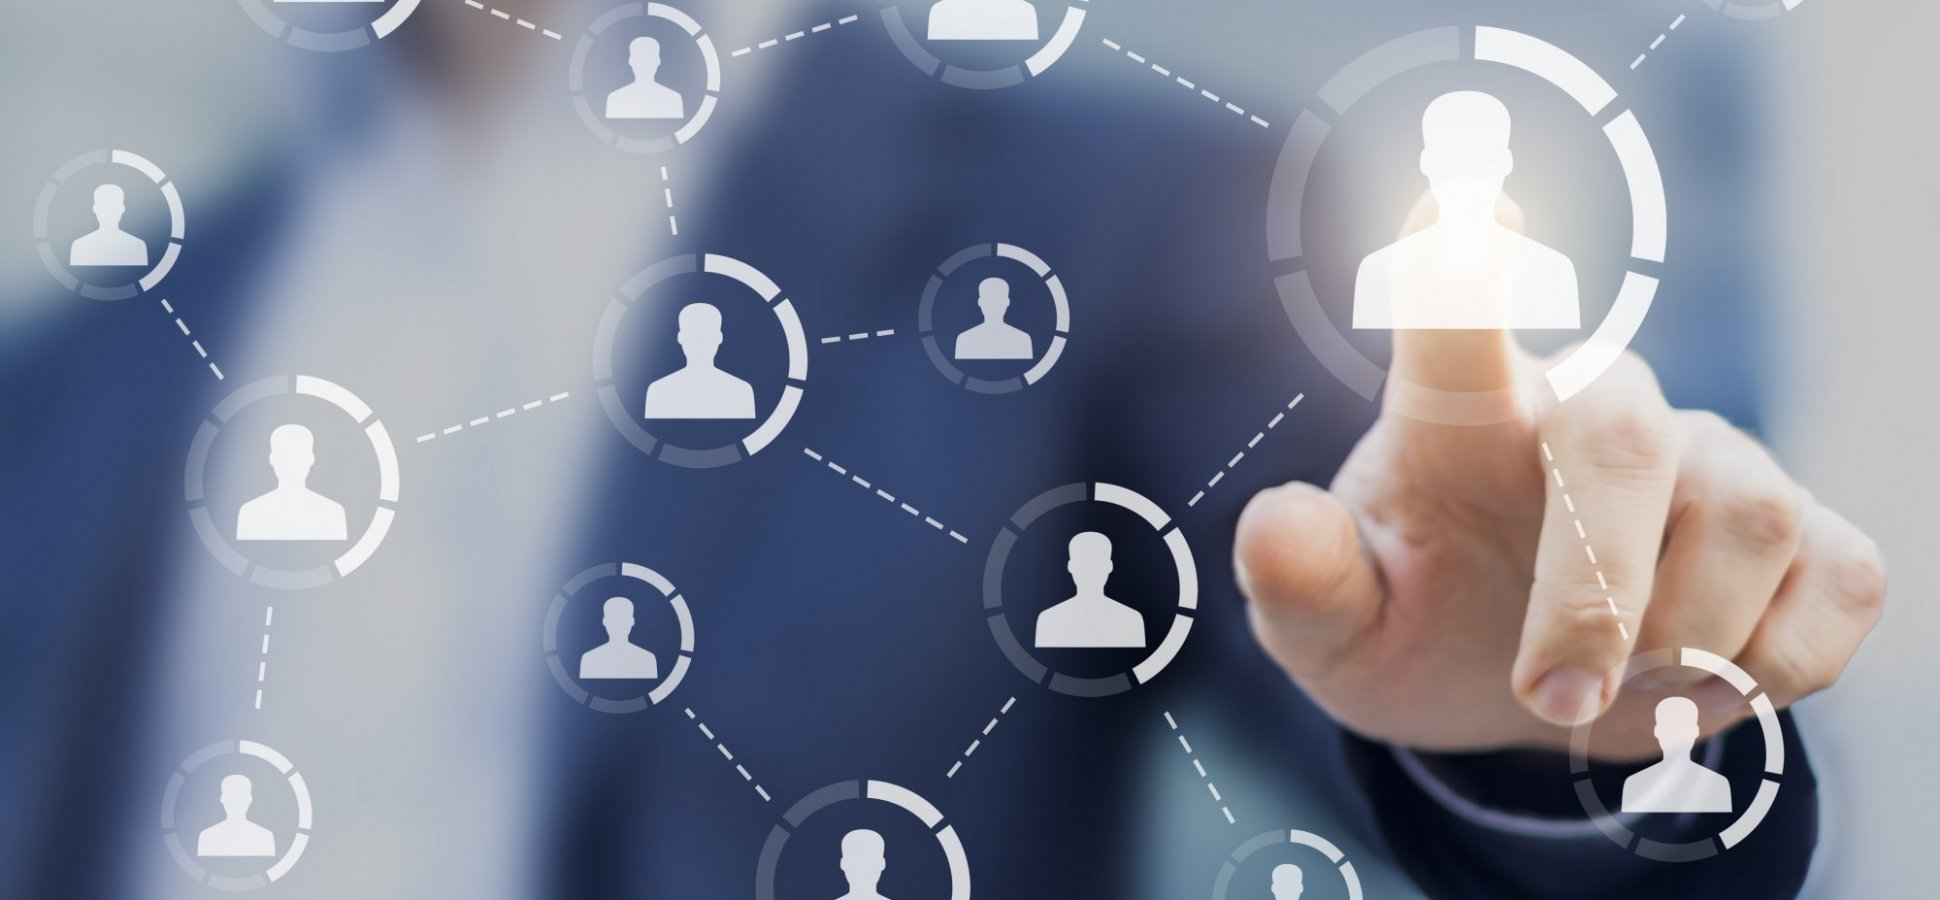 5 Visual Strategies for Lead Generation on Social Media